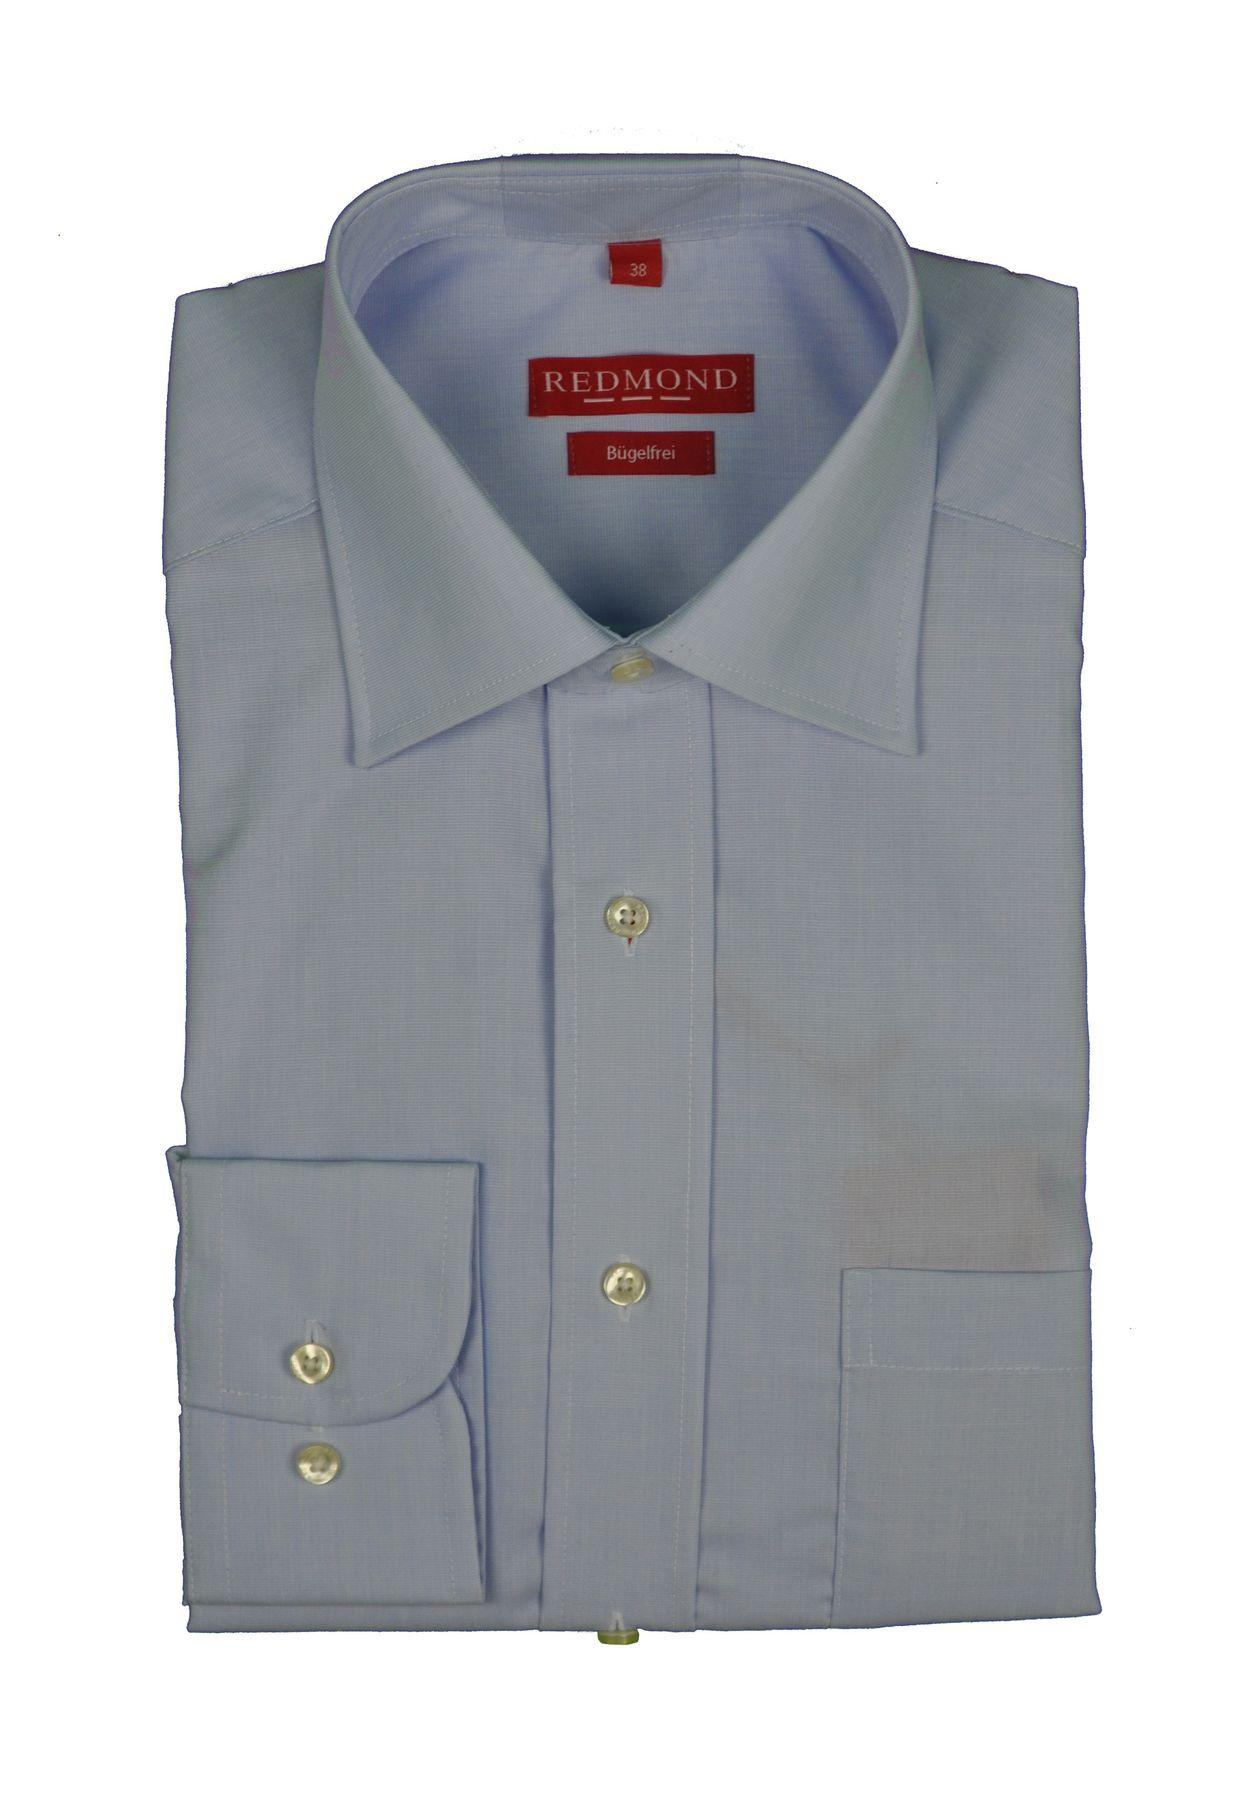 Redmond - Regular Fit - Bügelfreies Herren Langarm Hemd in verschiedenen Fil à Fil Farbmustern (200 100) – Bild 4